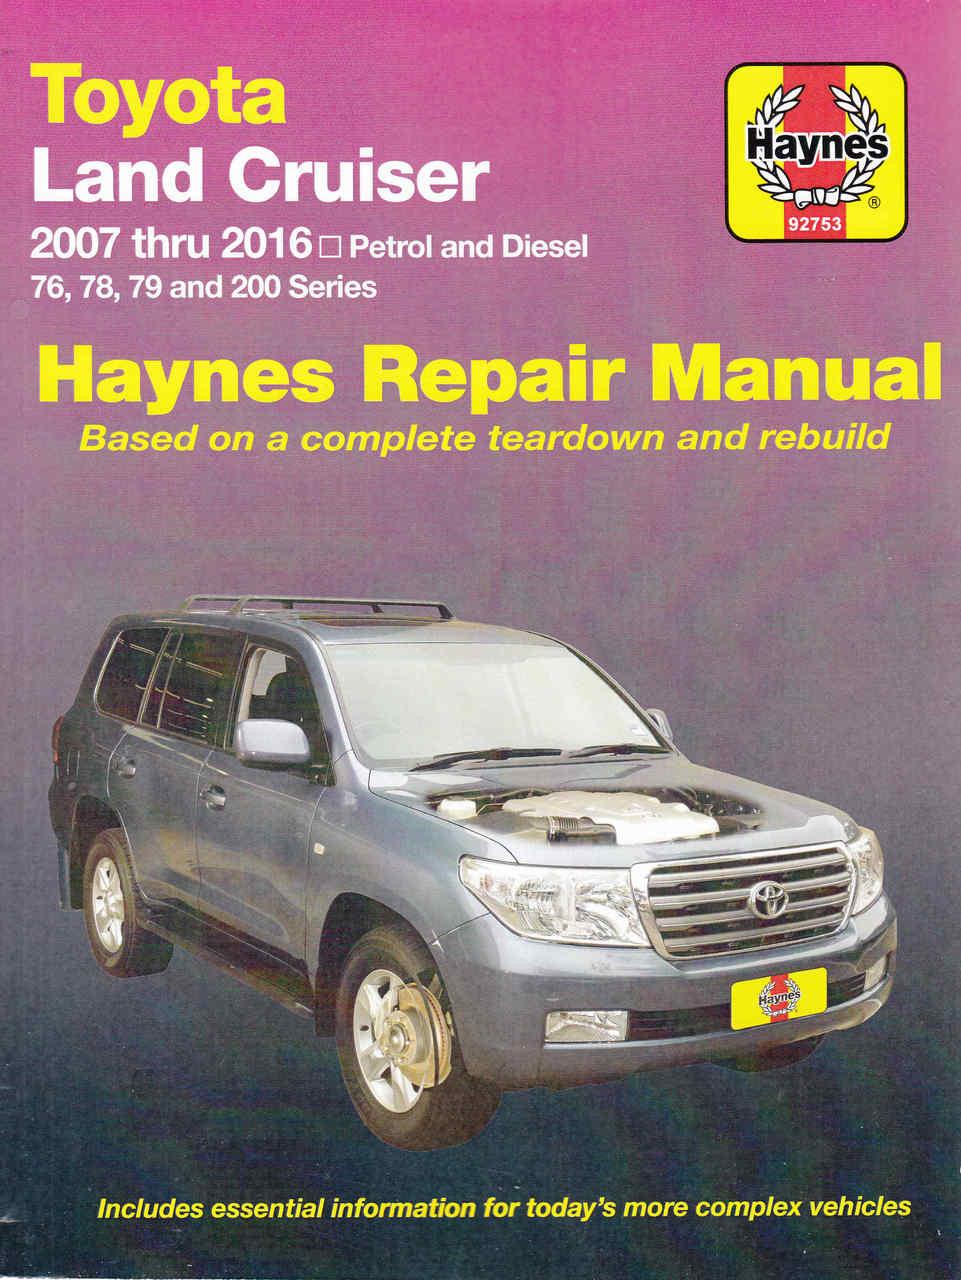 toyota land cruiser 76 78 79 and 200 series petrol diesel 2007 2016 workshop manual [ 961 x 1280 Pixel ]